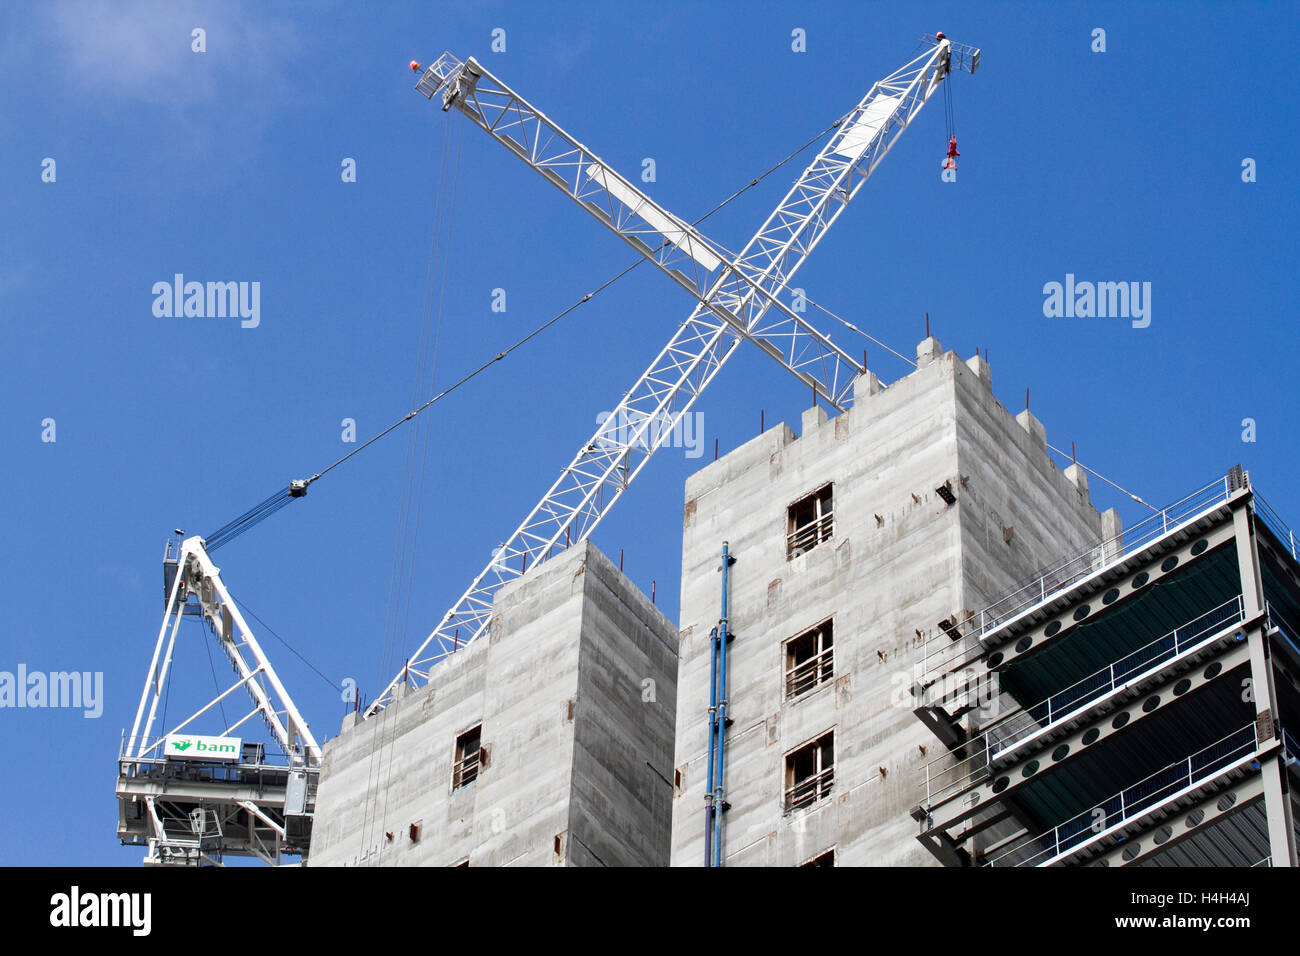 Affordable homes under construction, UK - Stock Image